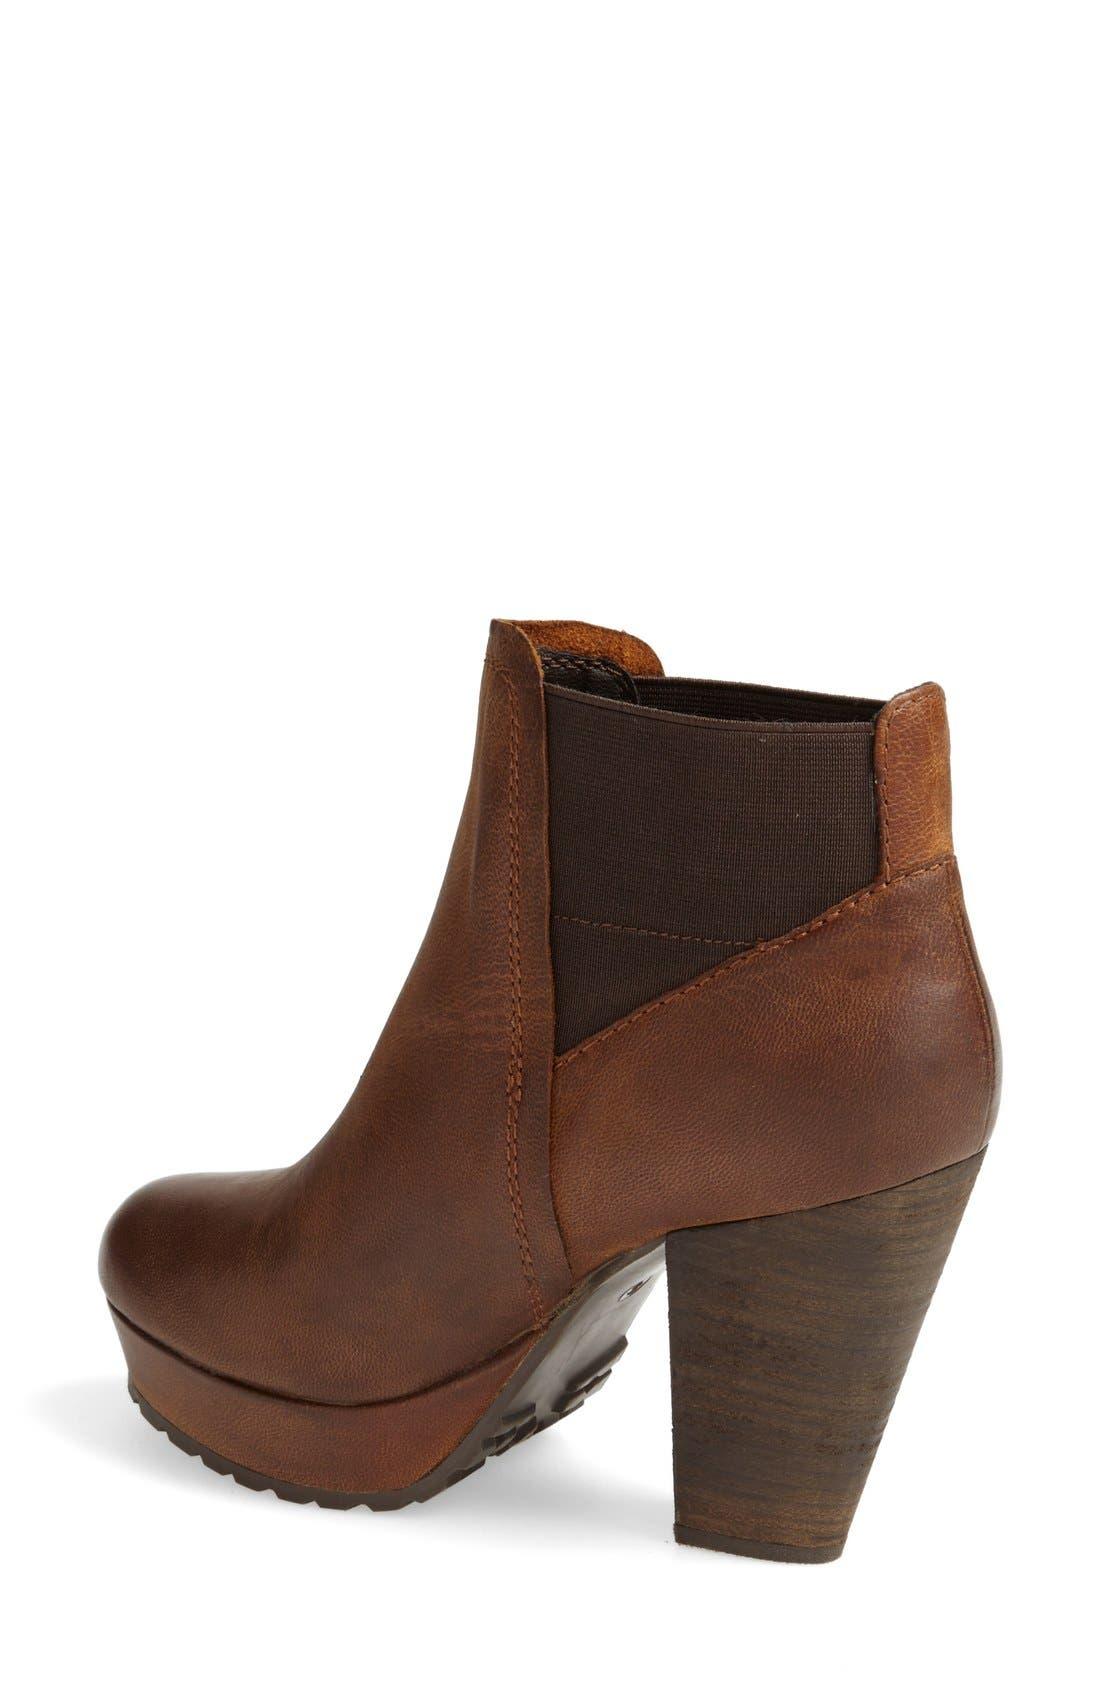 Alternate Image 2  - Steve Madden 'Randaal' Leather Platform Bootie (Women)